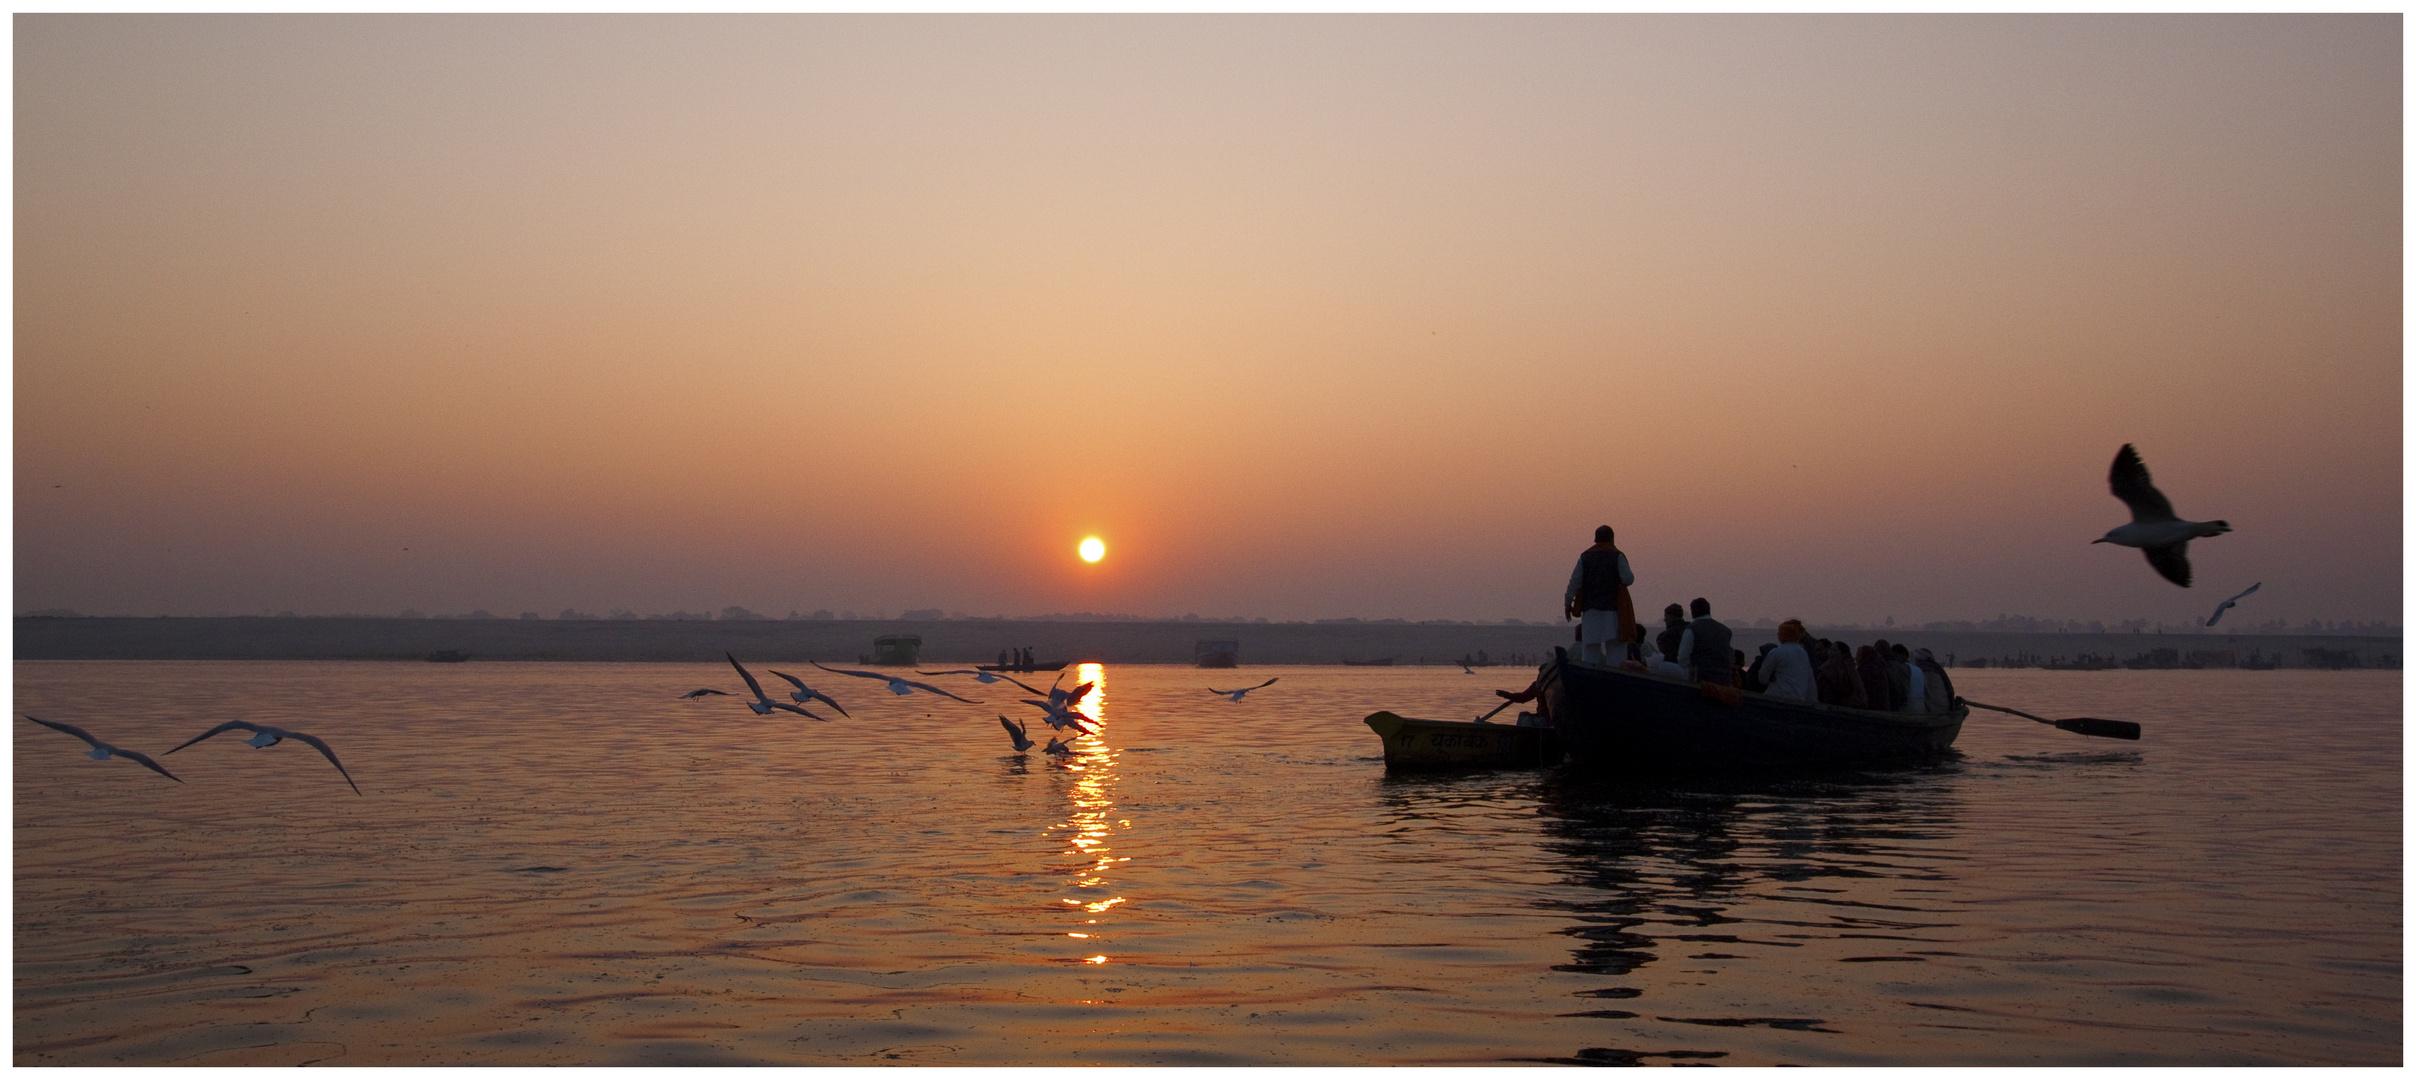 Guten Morgen Holy River Ganga!